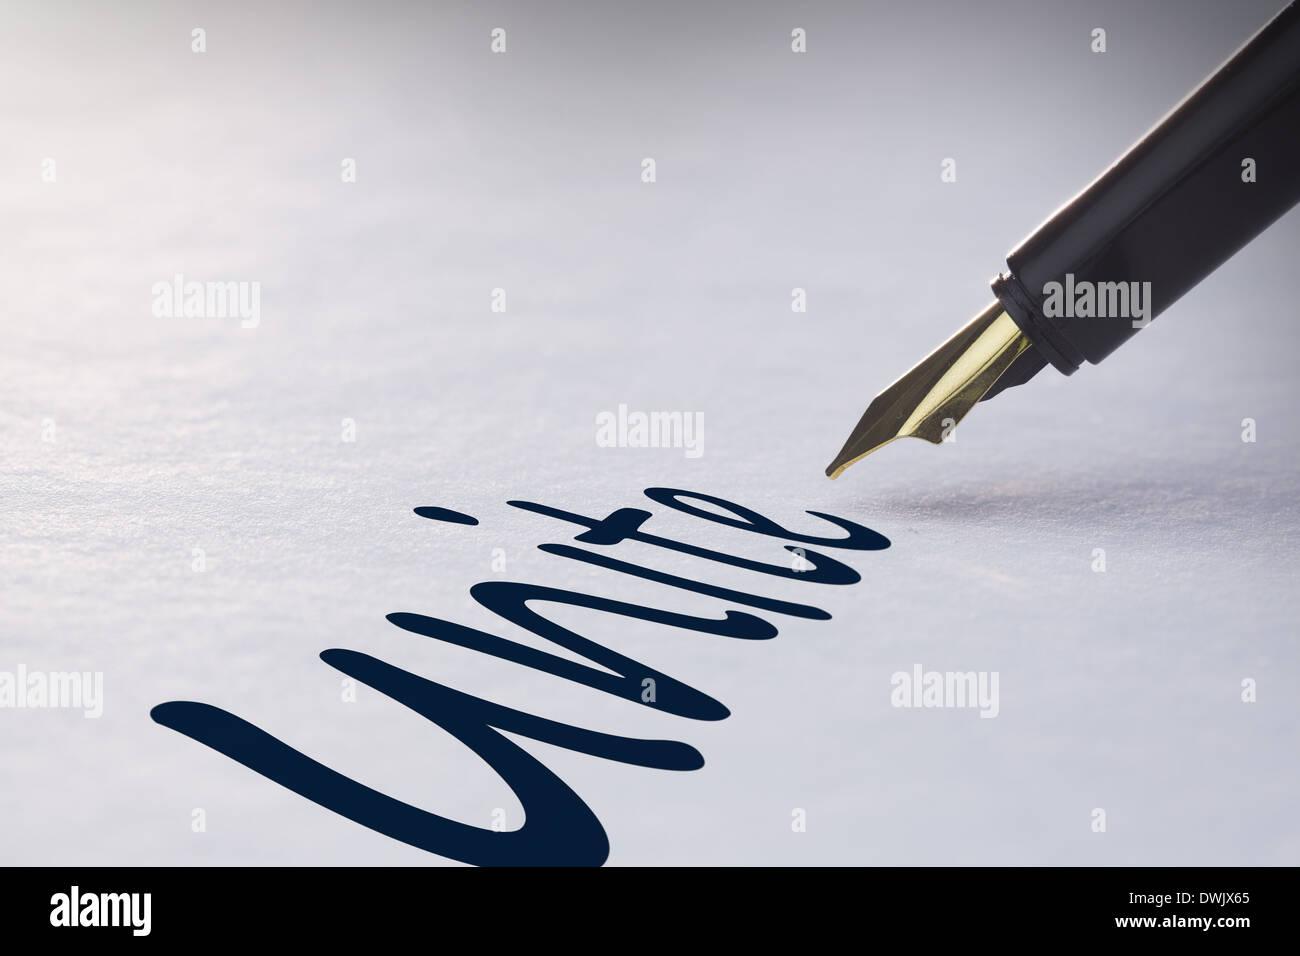 Fountain pen writing Unite - Stock Image